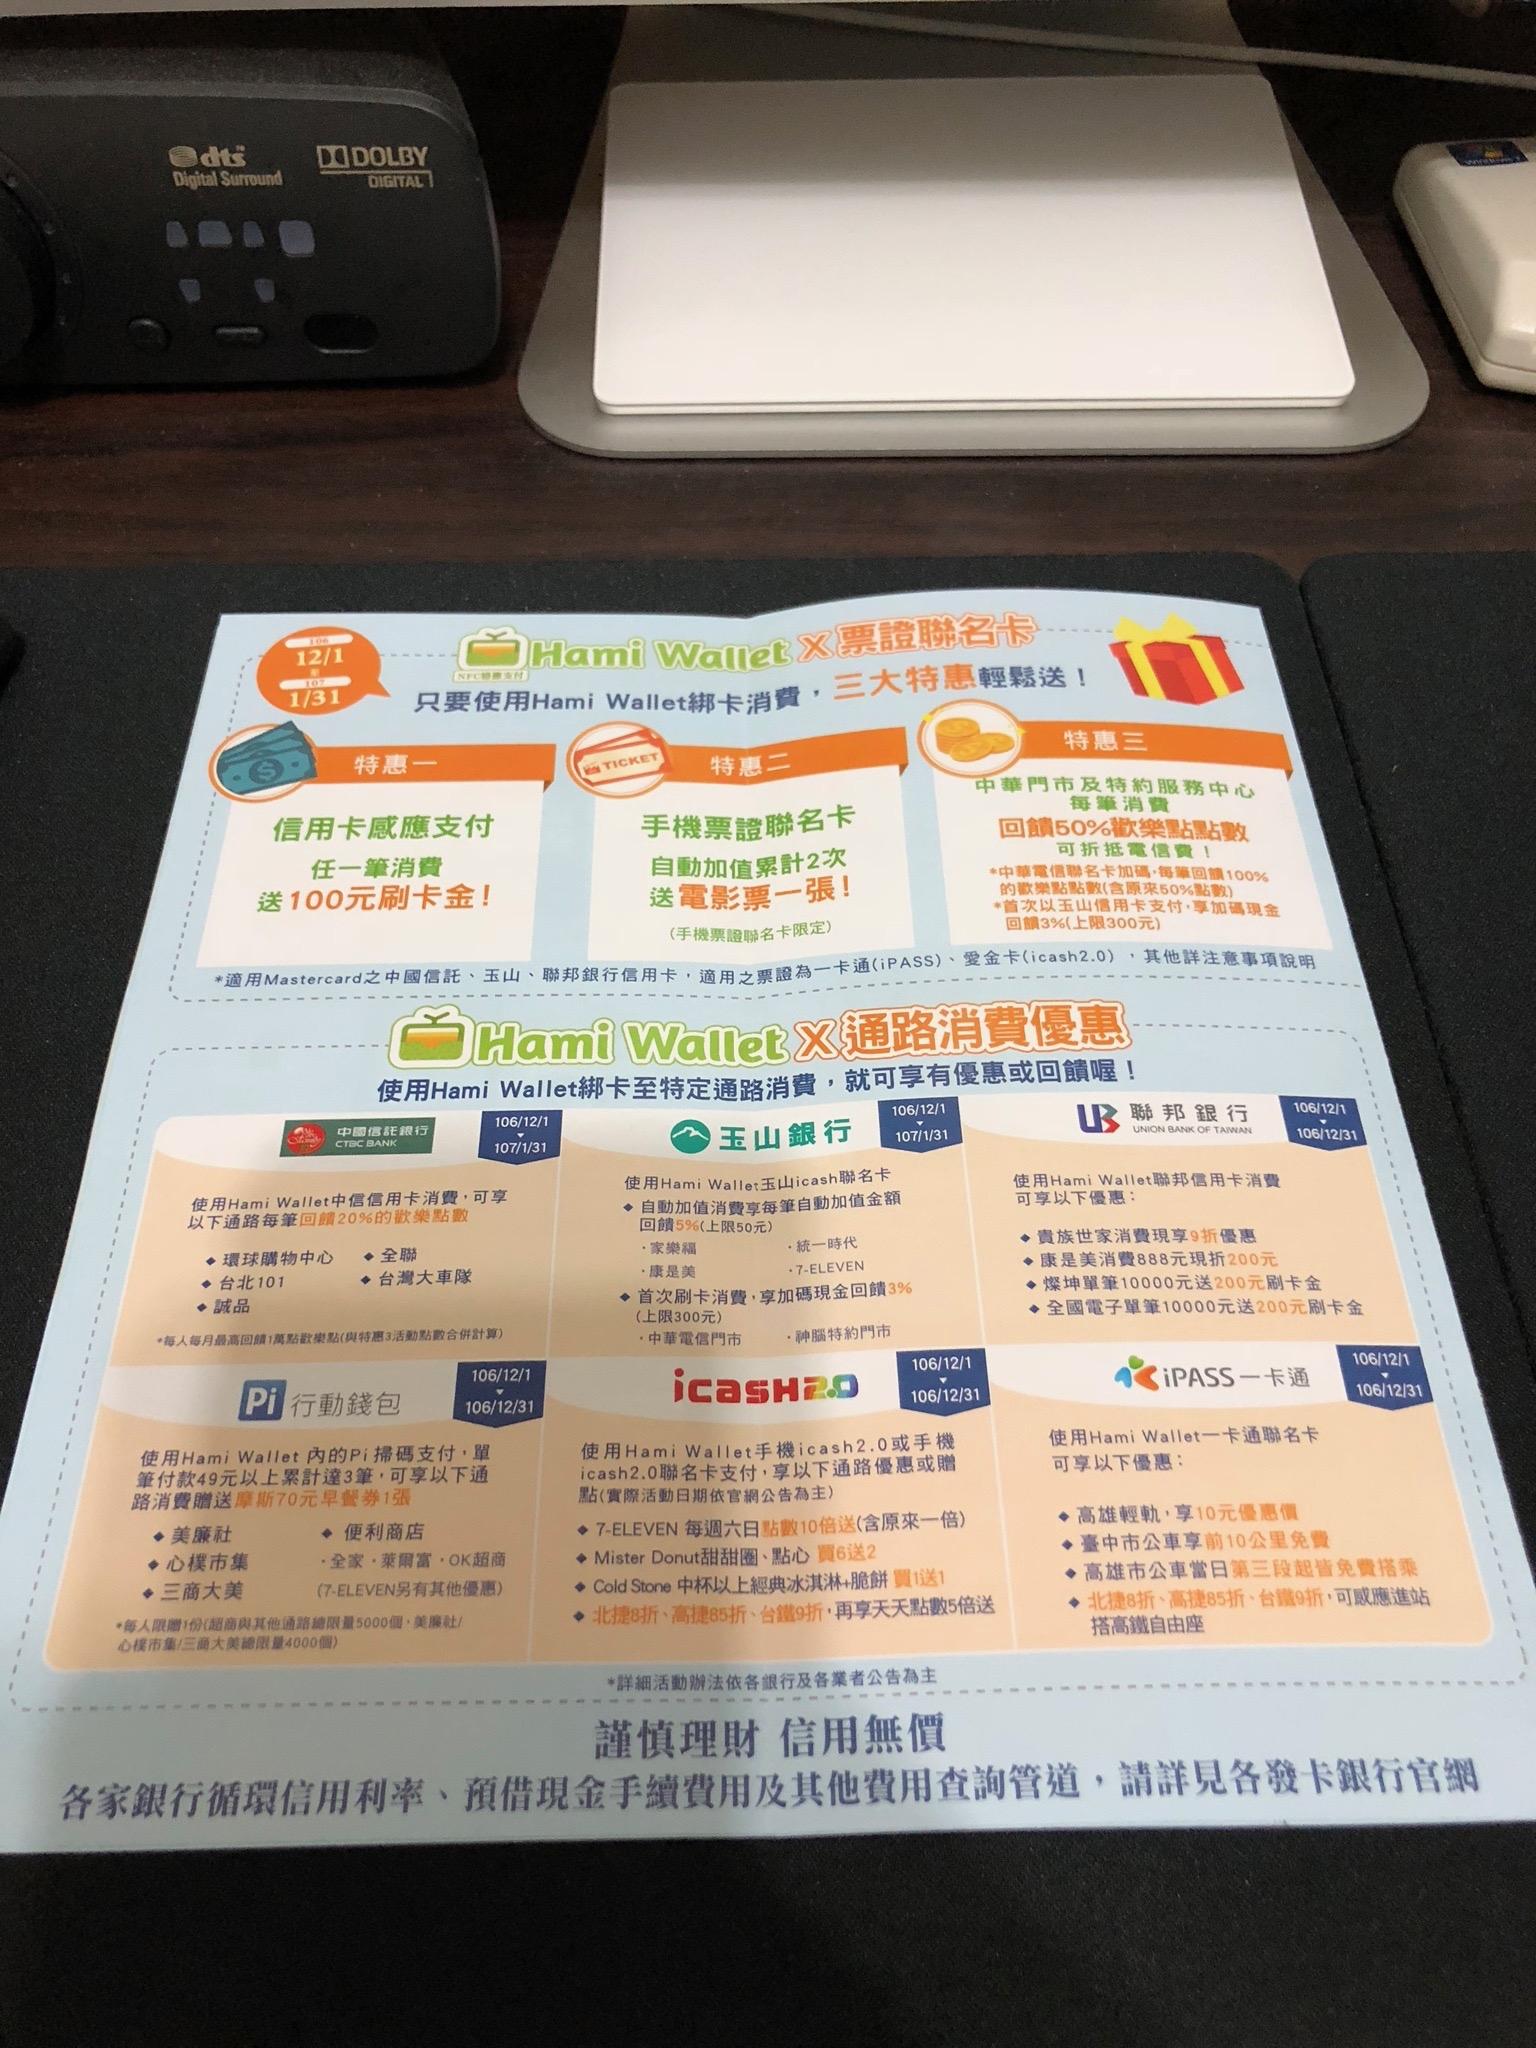 [12/1] 中華電信推出 Hami Wallet 自動加值 票證聯名卡! - Mobile01